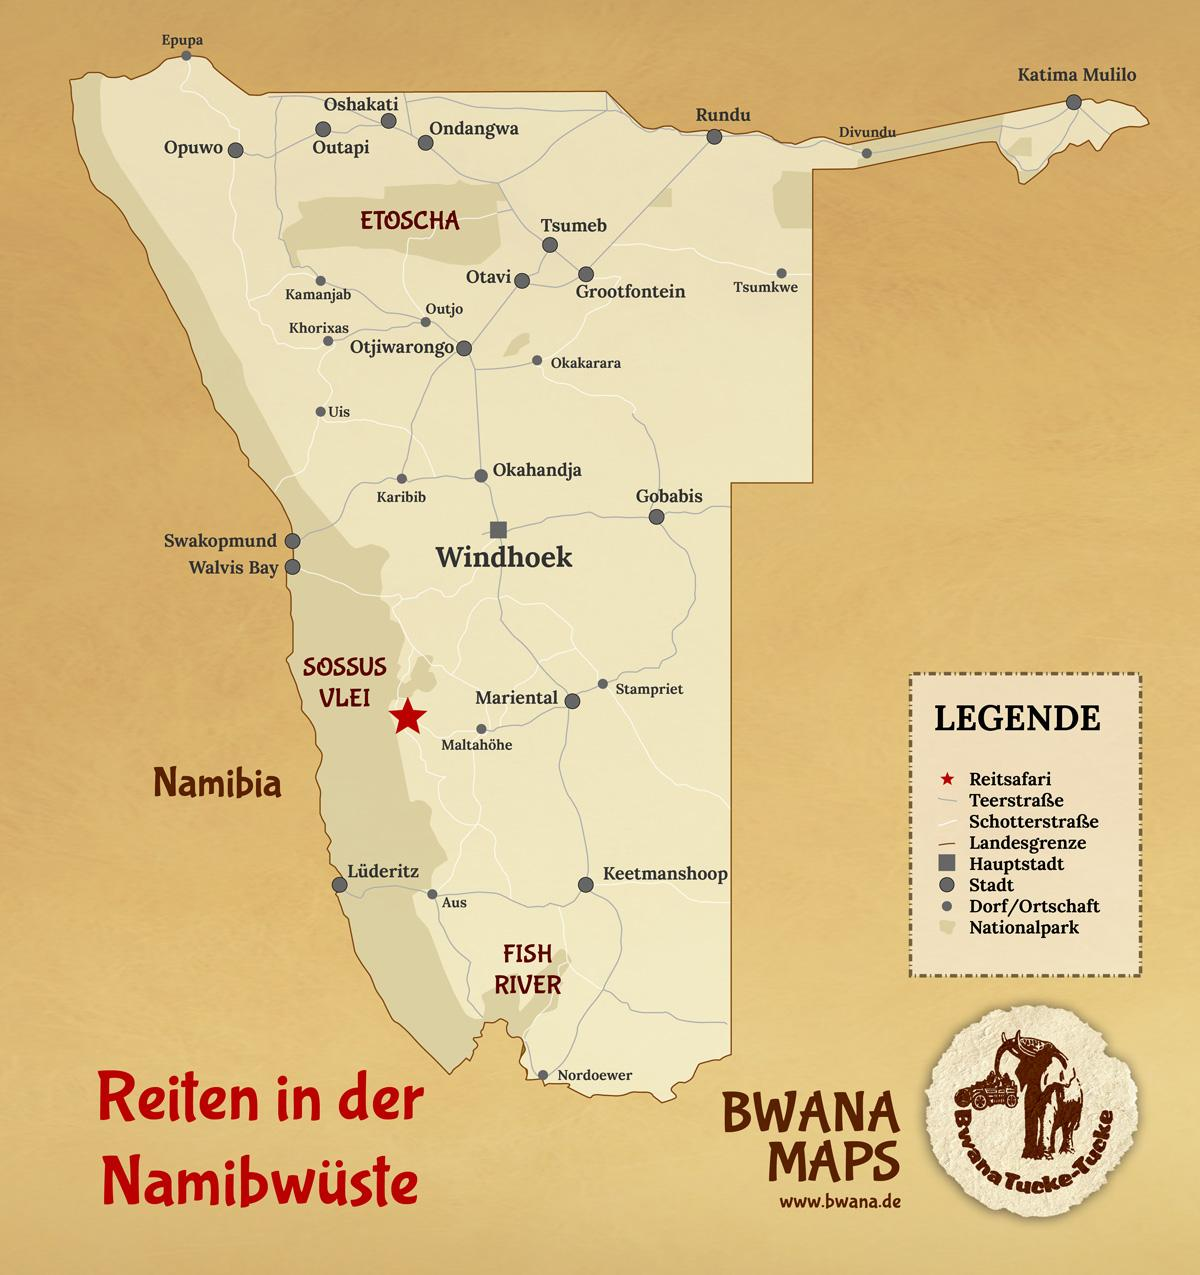 Namib Wüste Karte.Namib Wüste Karte Karte